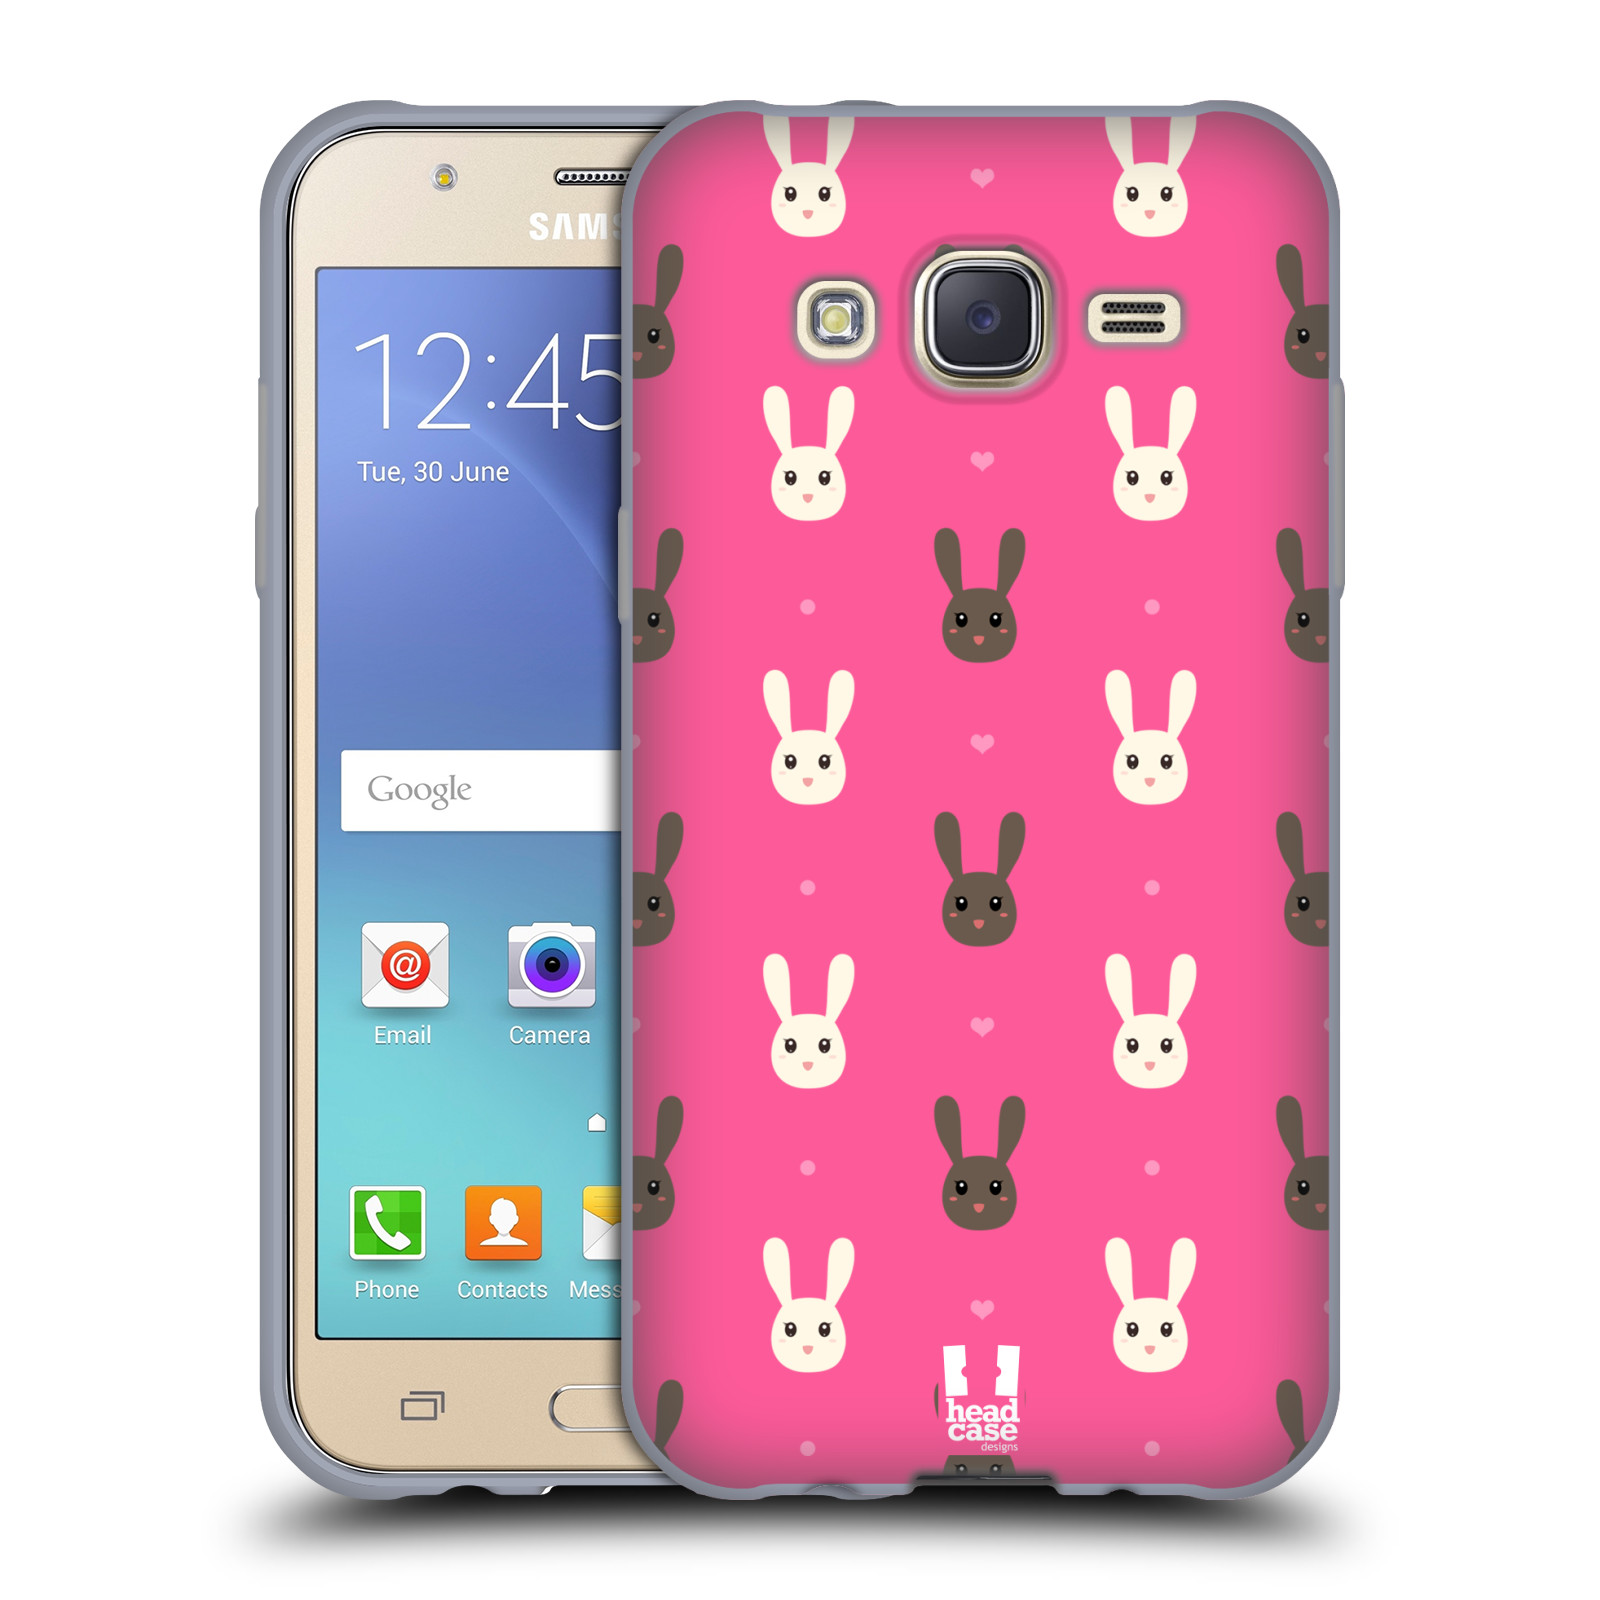 HEAD CASE silikonový obal na mobil Samsung Galaxy J5, J500, (J5 DUOS) vzor Barevní zajíčci RŮŽOVÁ hnědý a bílý králíček